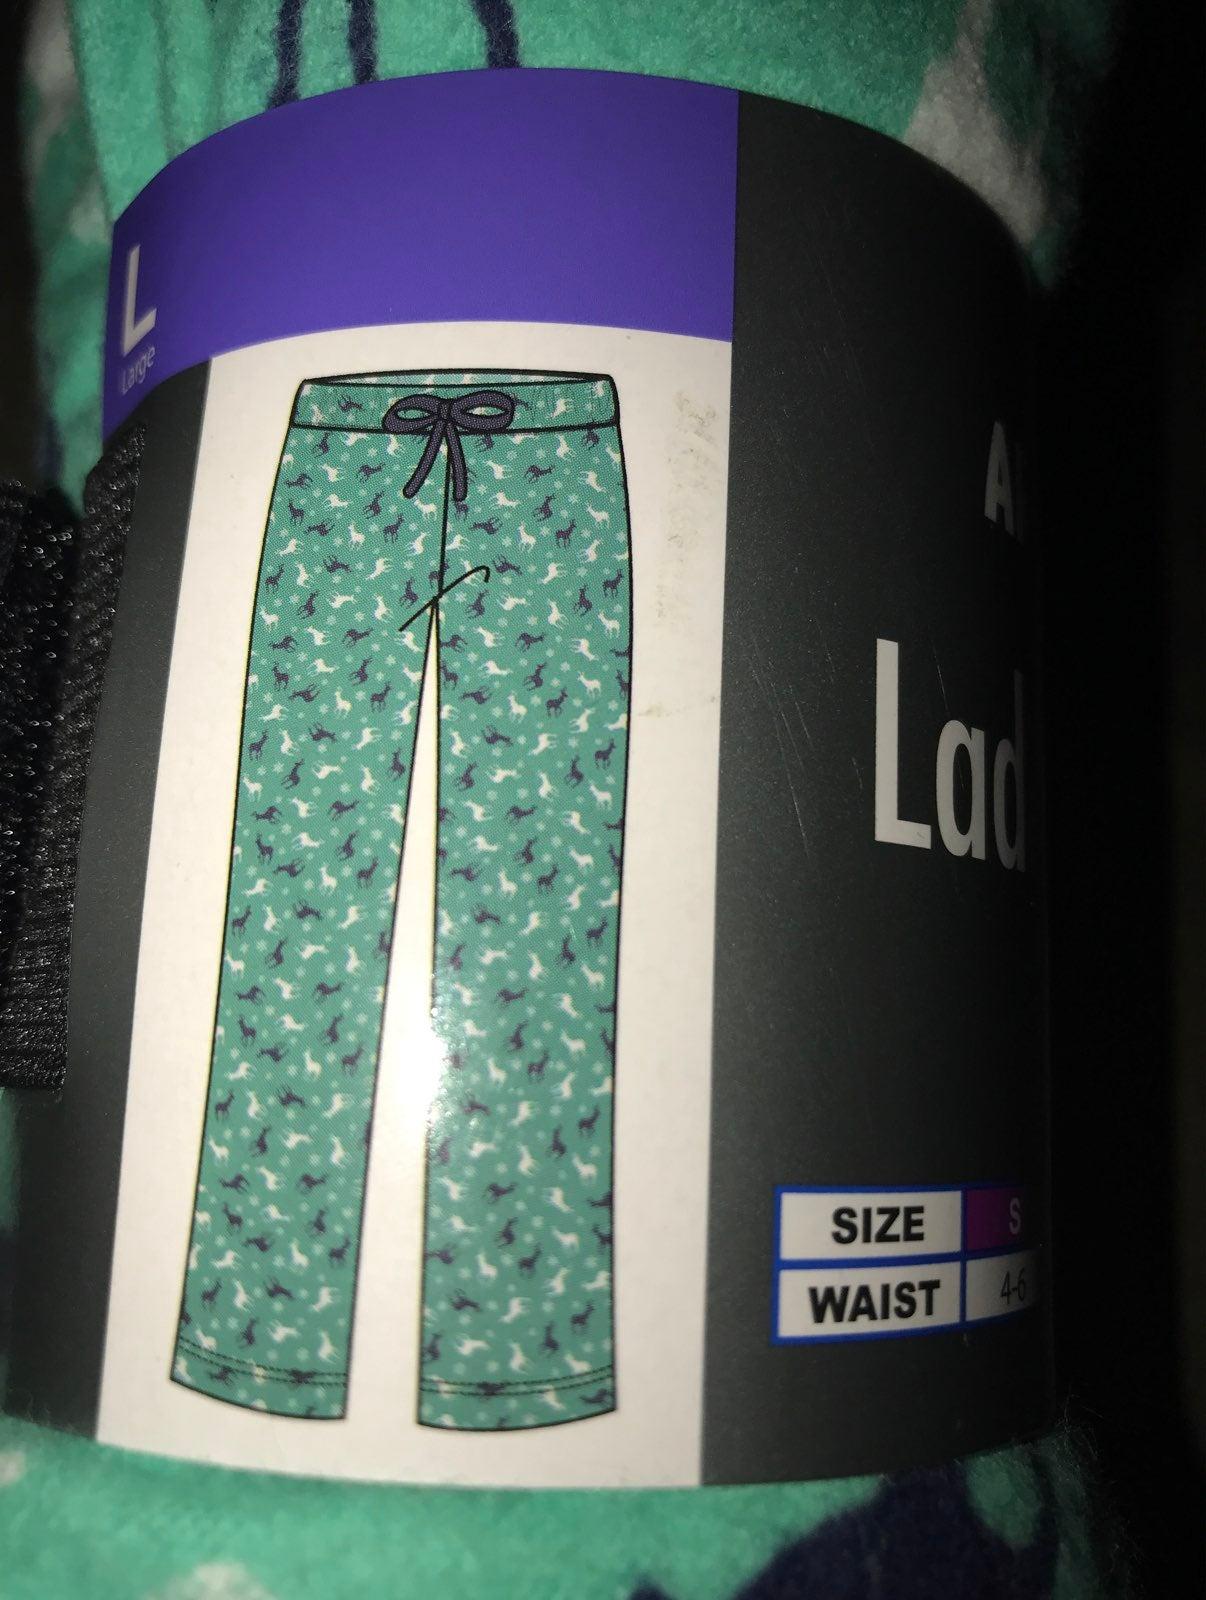 flannel pajamas sise L